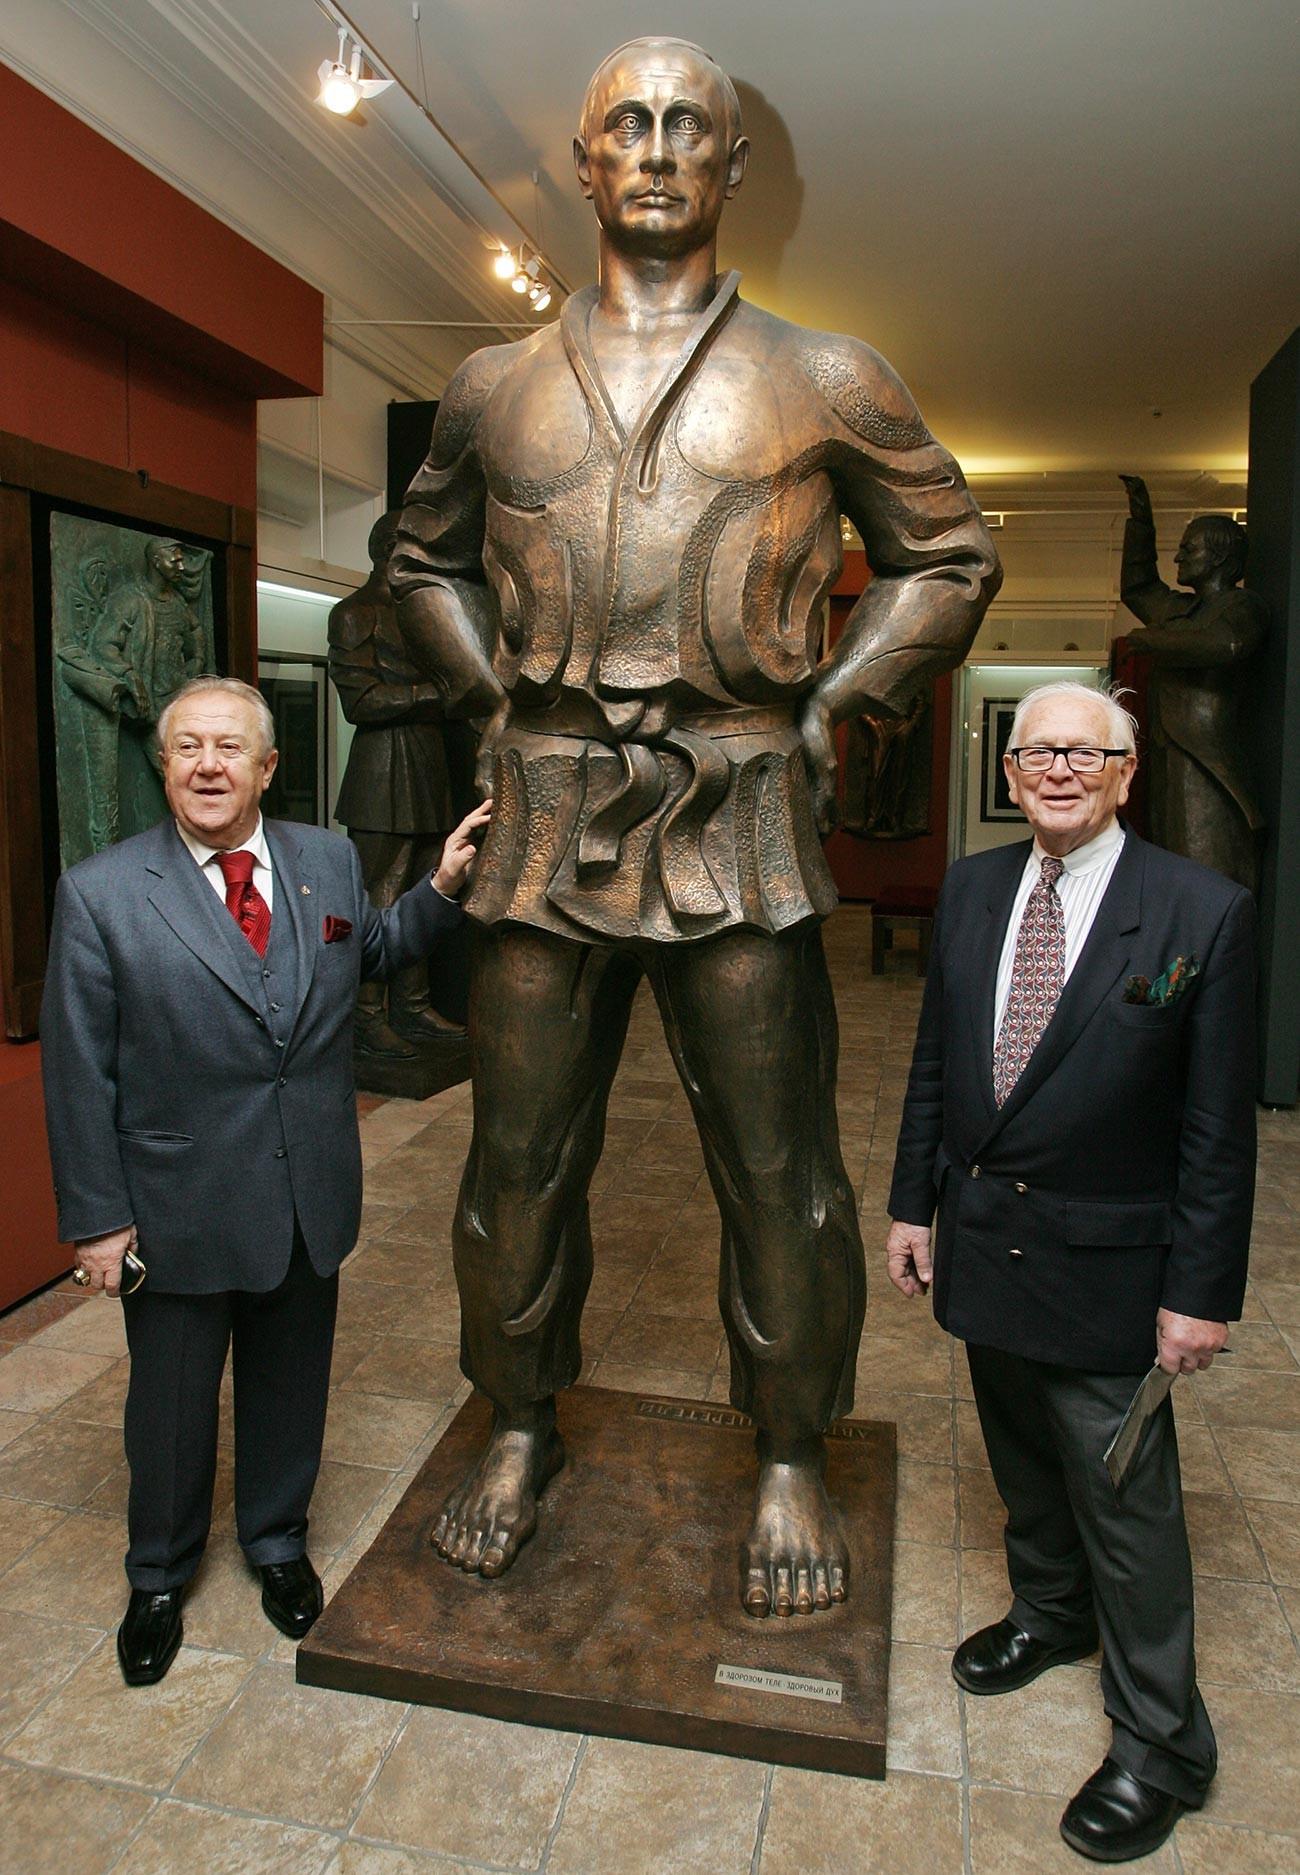 Russian sculptor Zurab Tsereteli, his statue of Vladimir Putin, and Pierre Cardin. Tsereteli awarded Cardin honorary membership into the  the Russian Academy of Arts, 2008